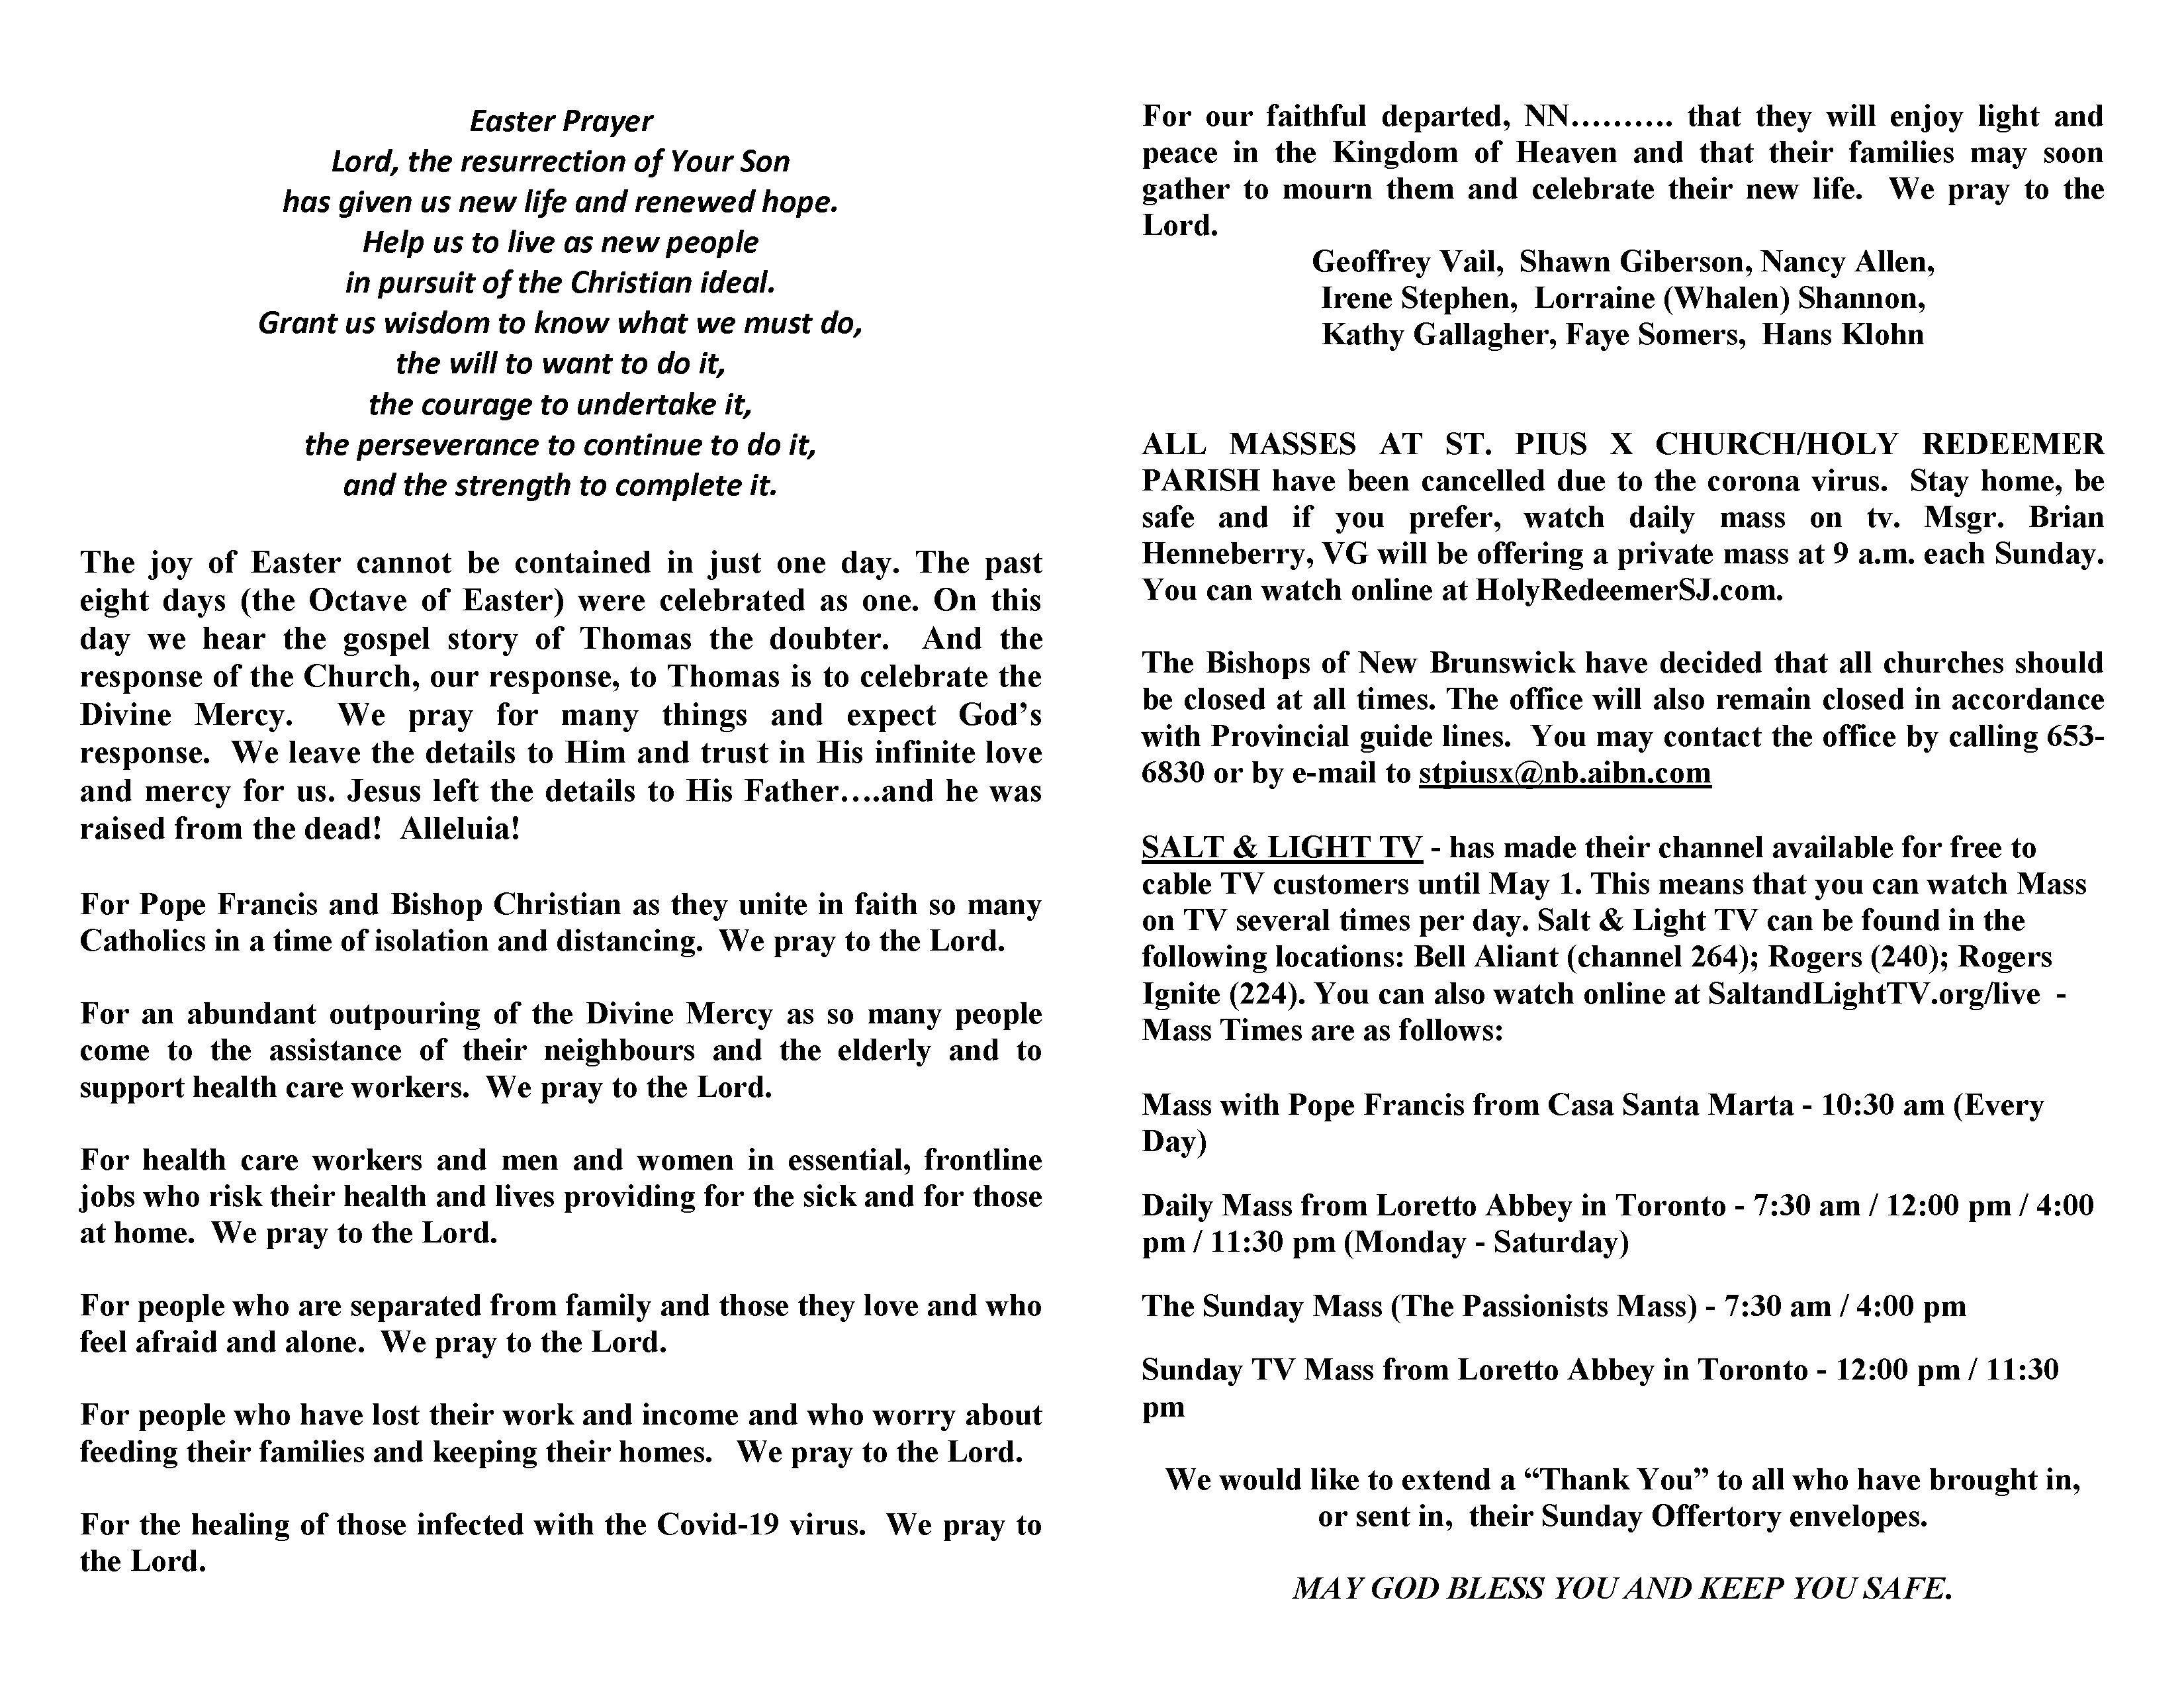 04-19-20